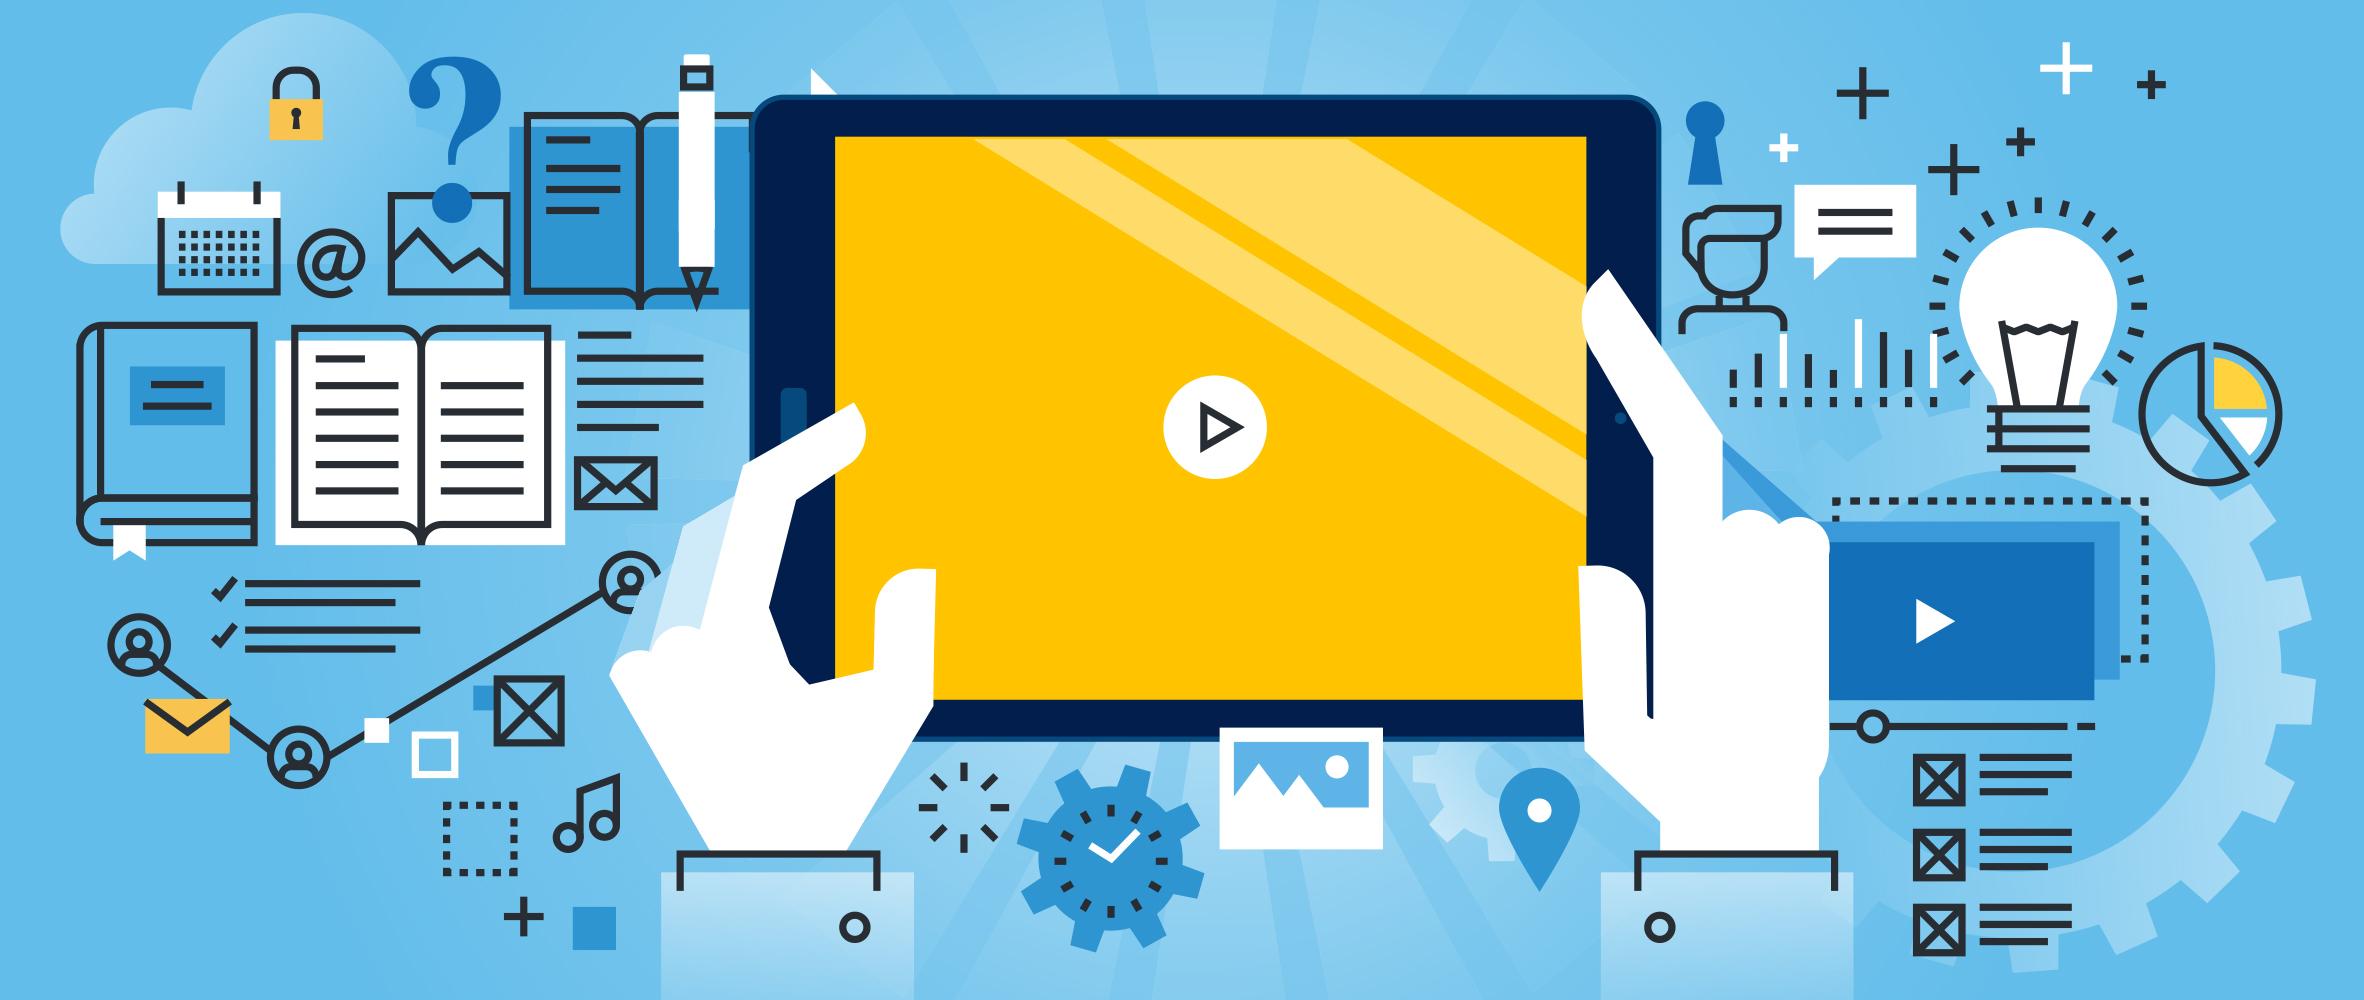 5 Benefits of On-Demand Customer Feedback with User Testing (UX)